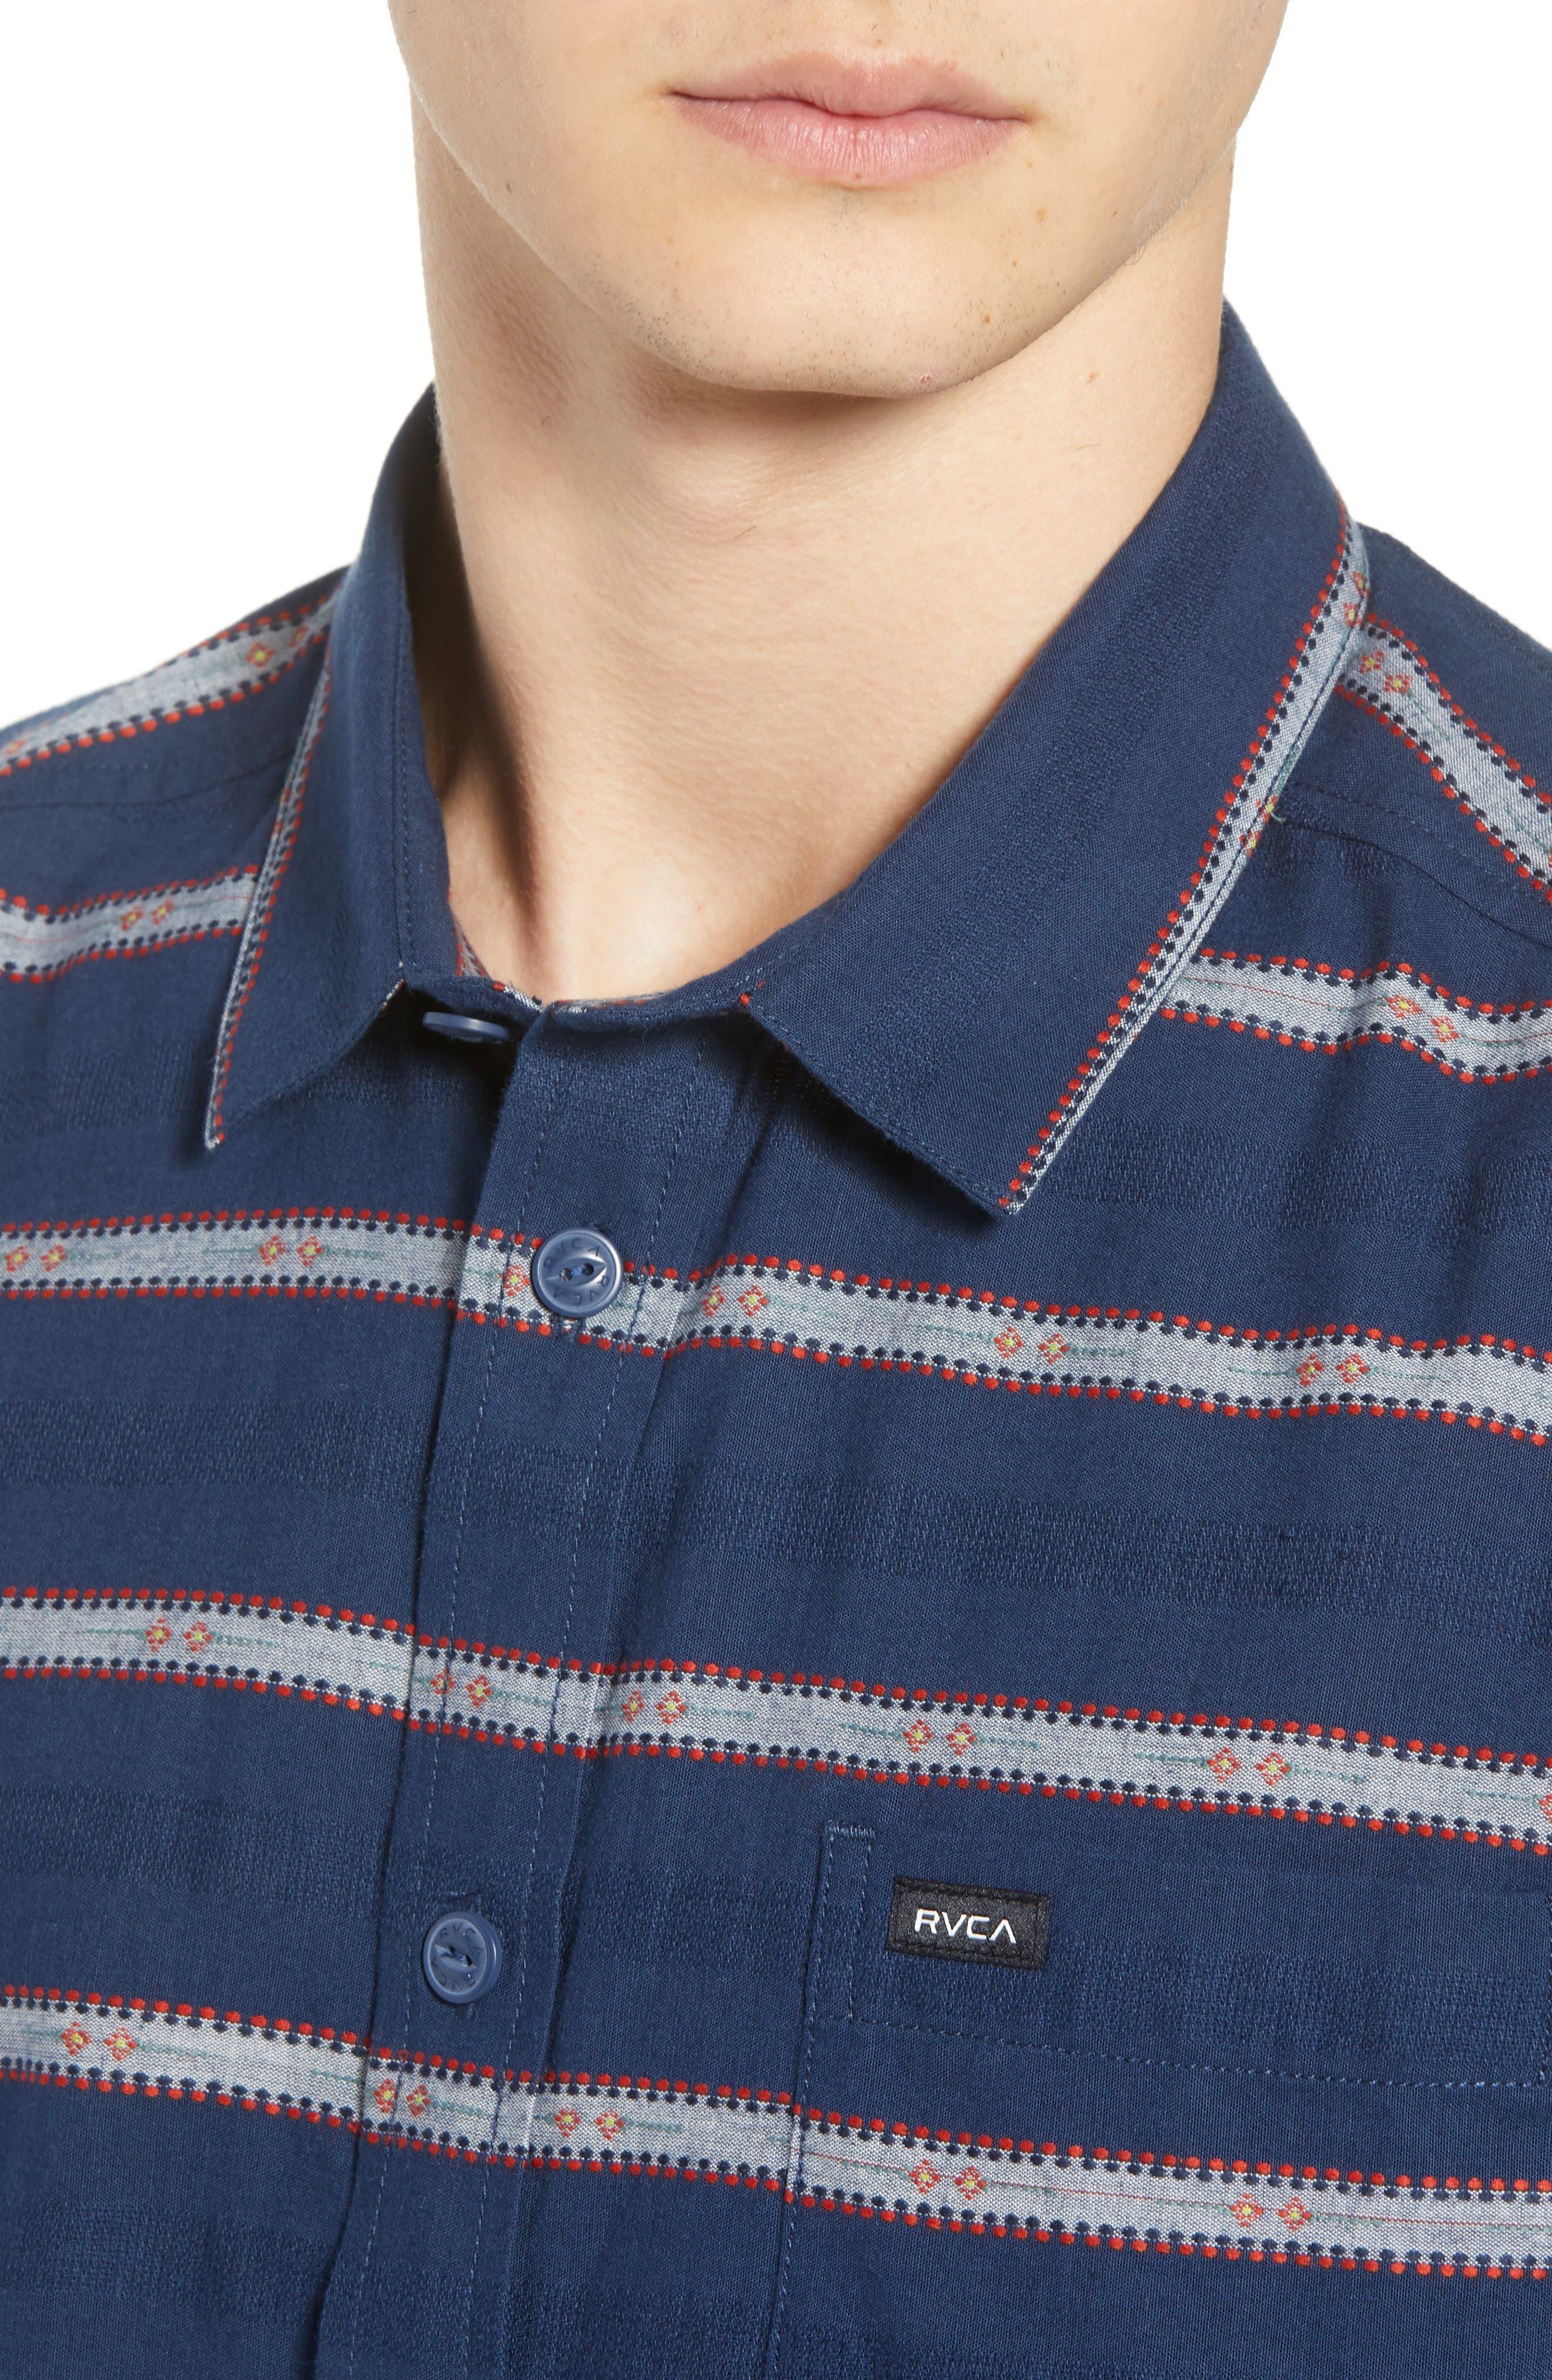 Outer Sunset Woven Shirt,                             Alternate thumbnail 4, color,                             SEATTLE BLUE